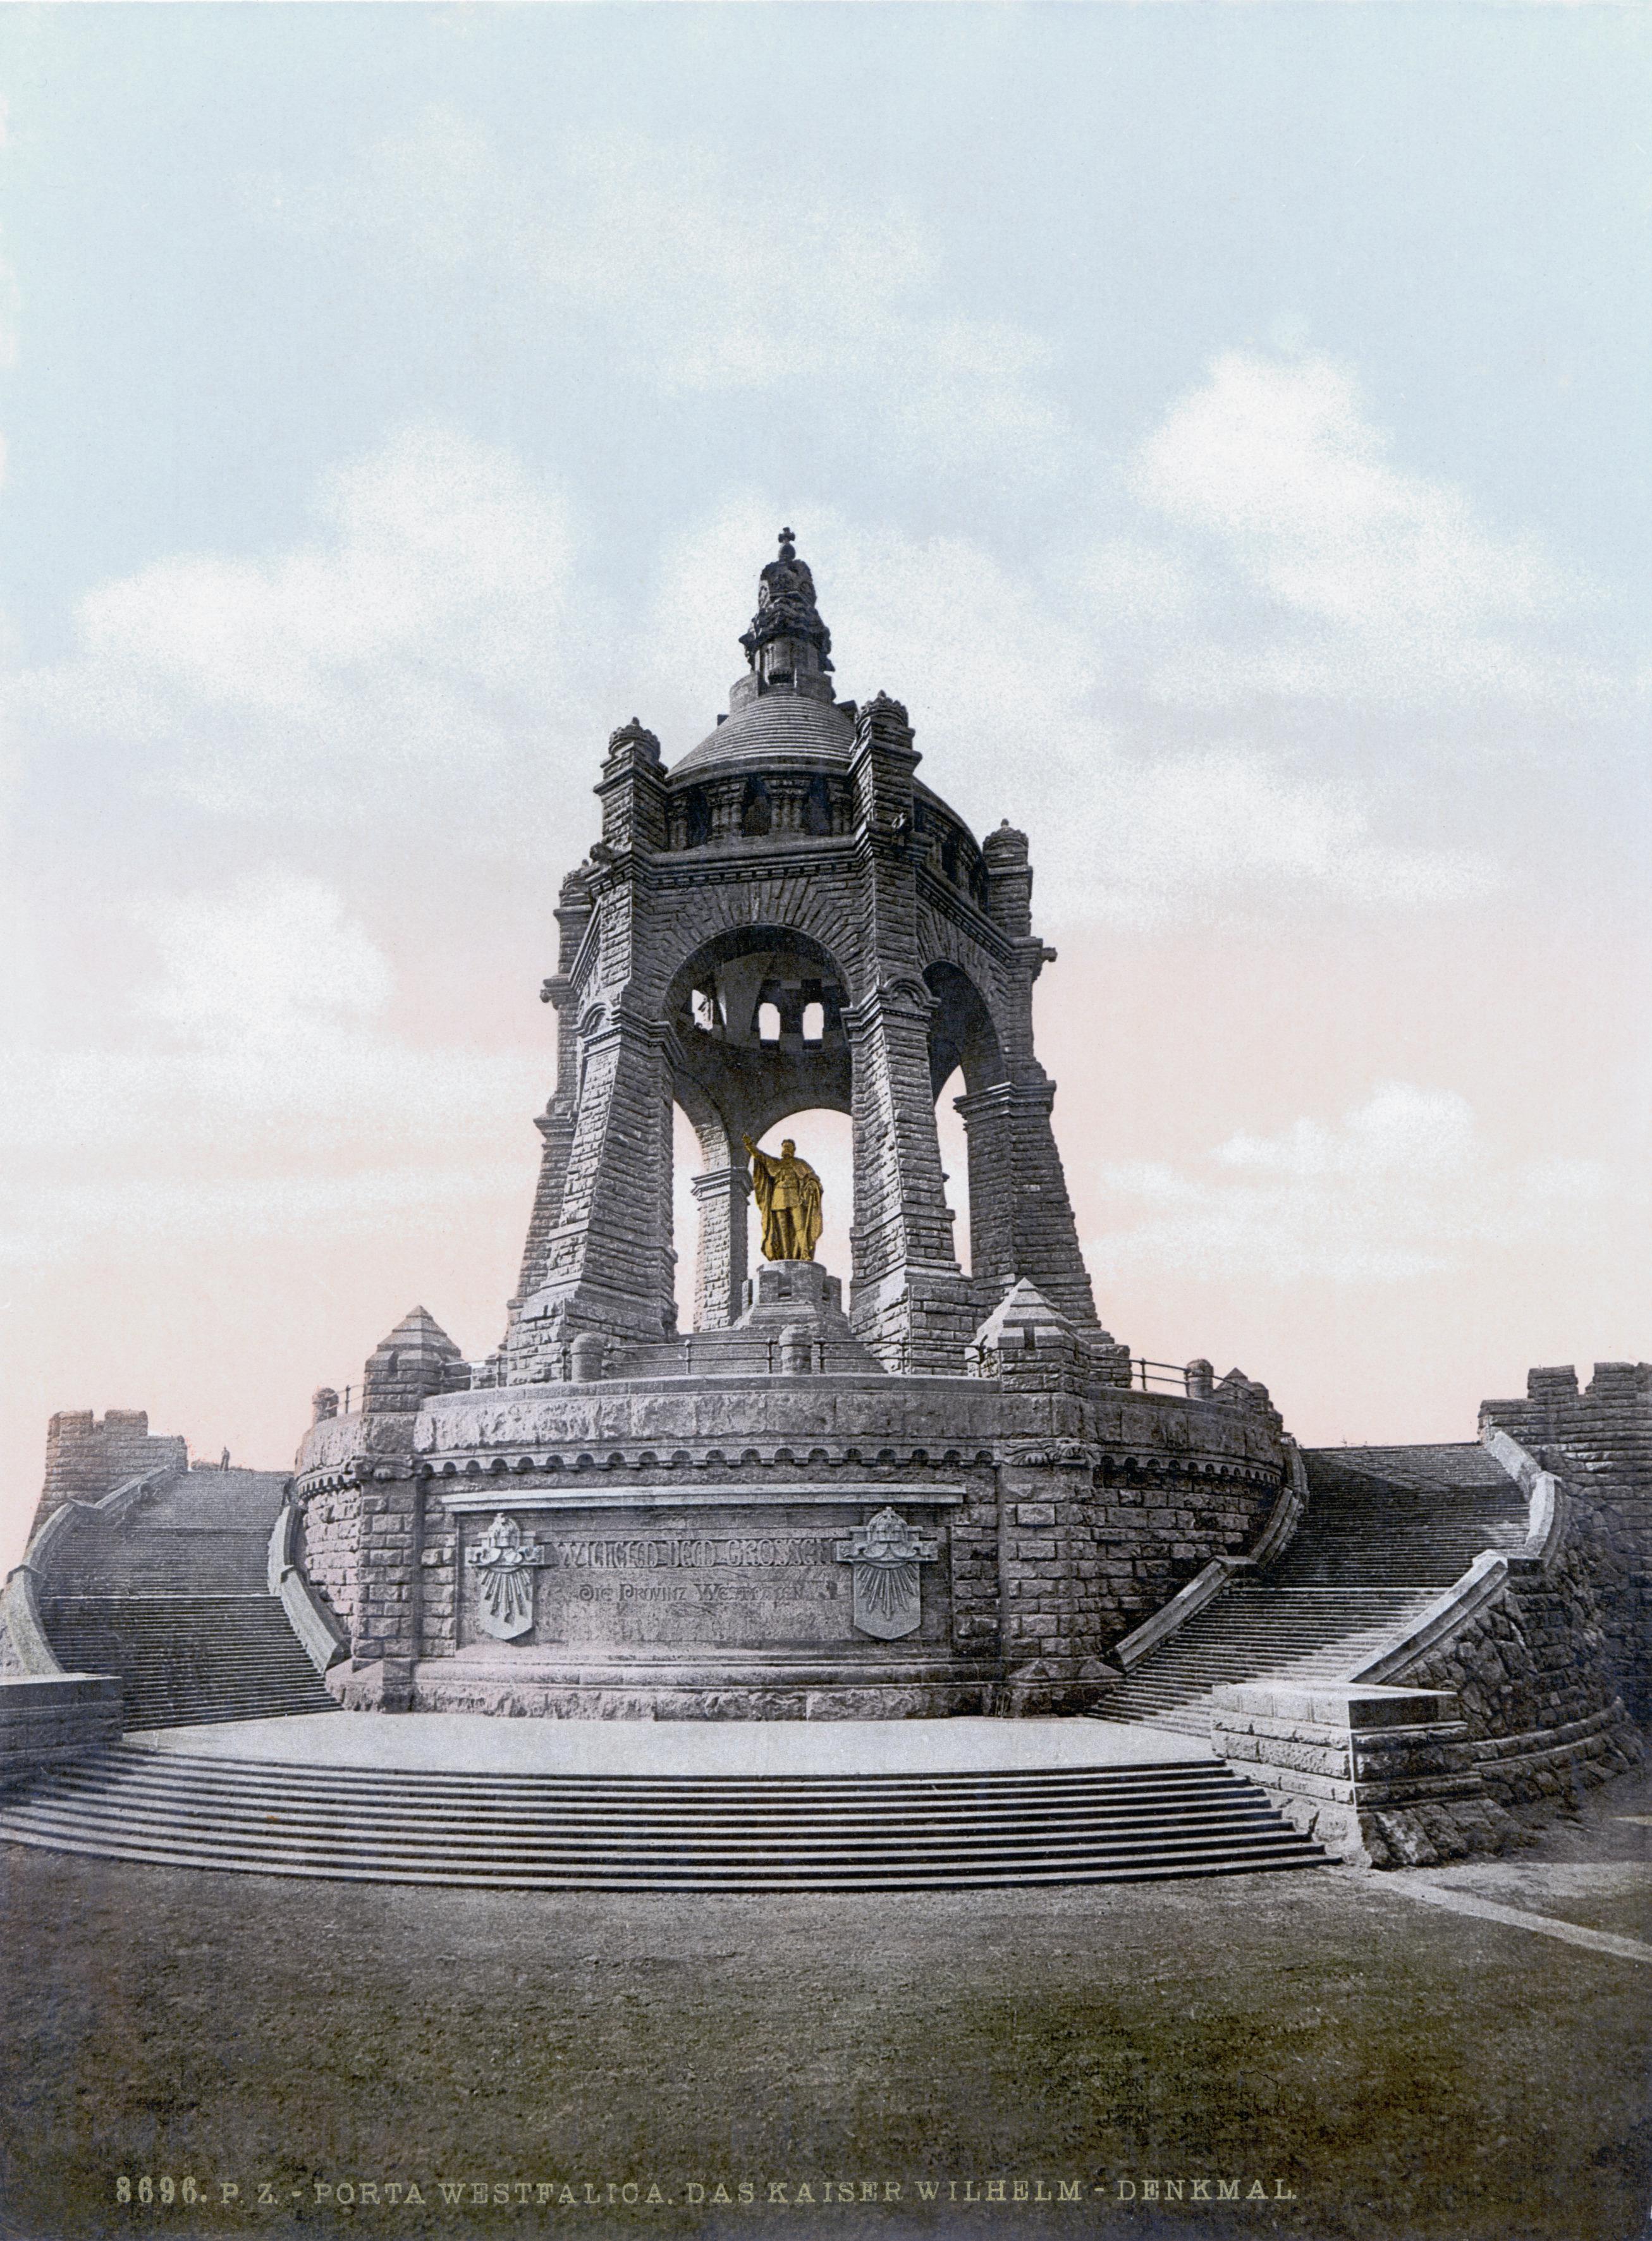 Denkmal Wilhelm 1 Das Kaiser Wilhelm-denkmal